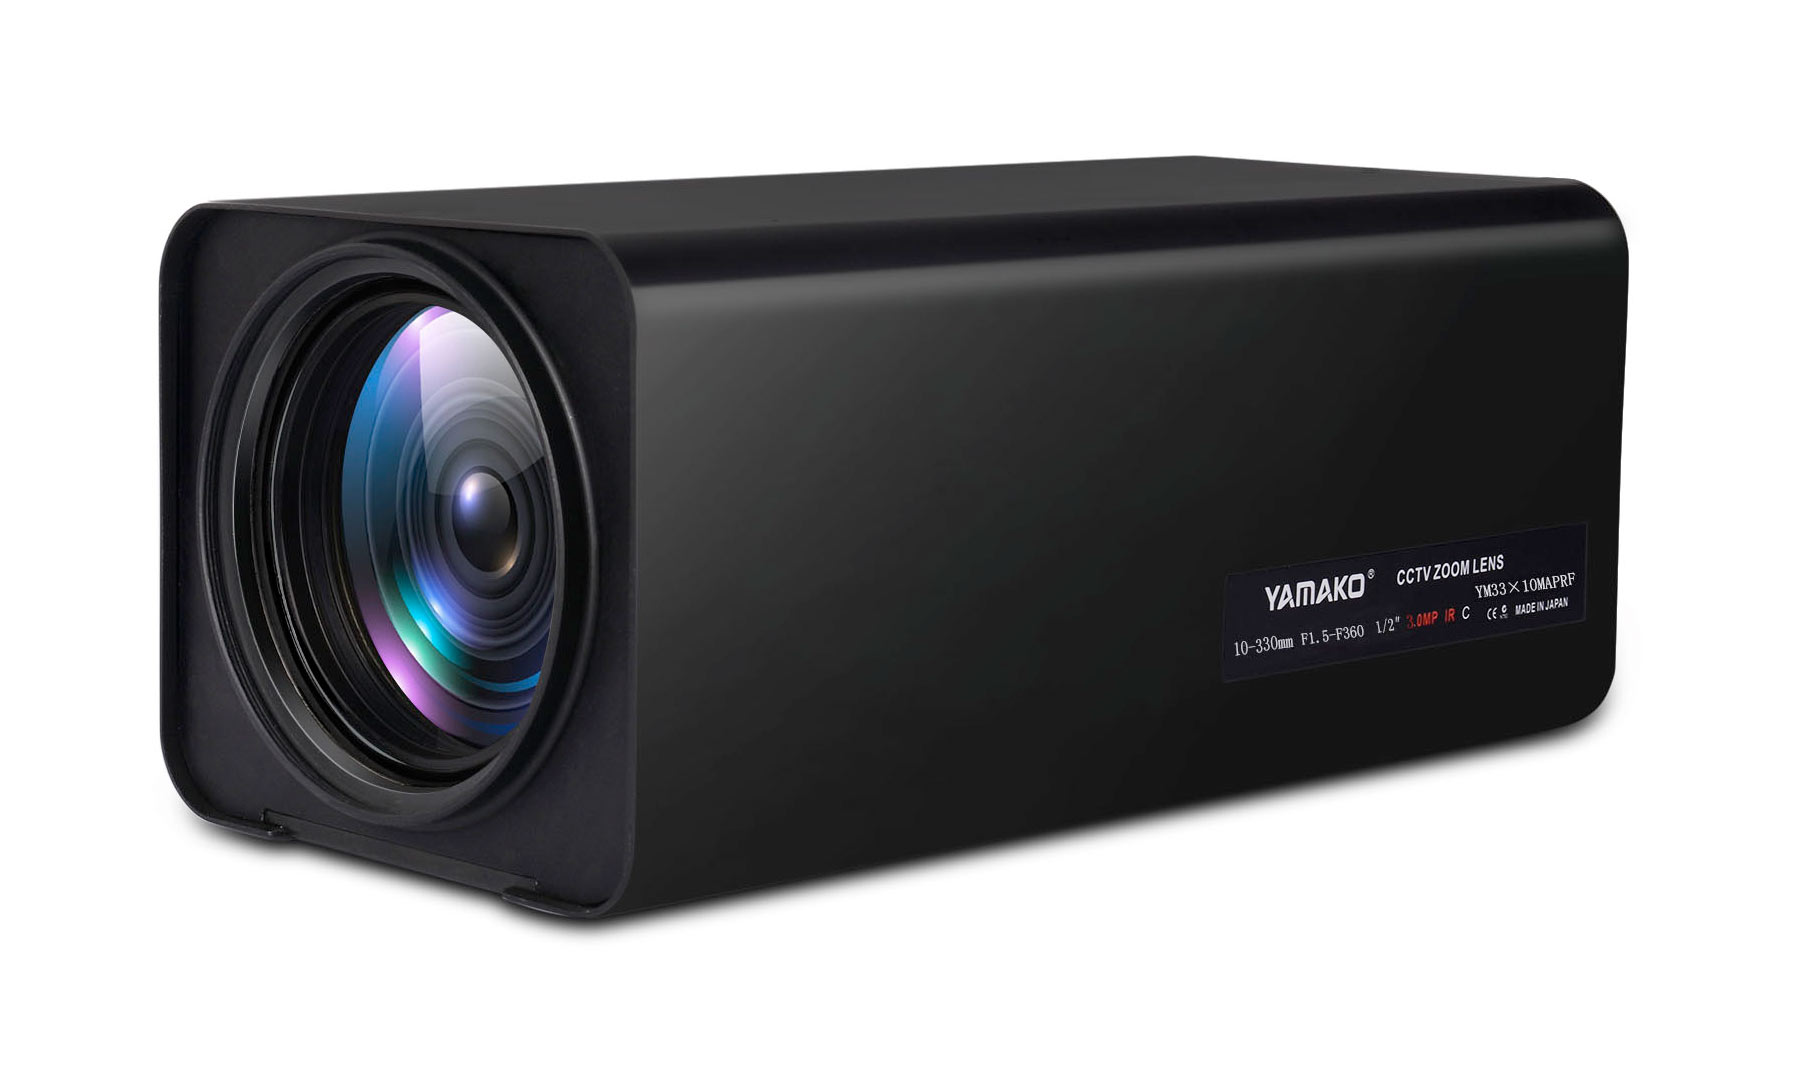 12.5-775mm电动变倍镜头 YAMAKO百万像素高清镜头